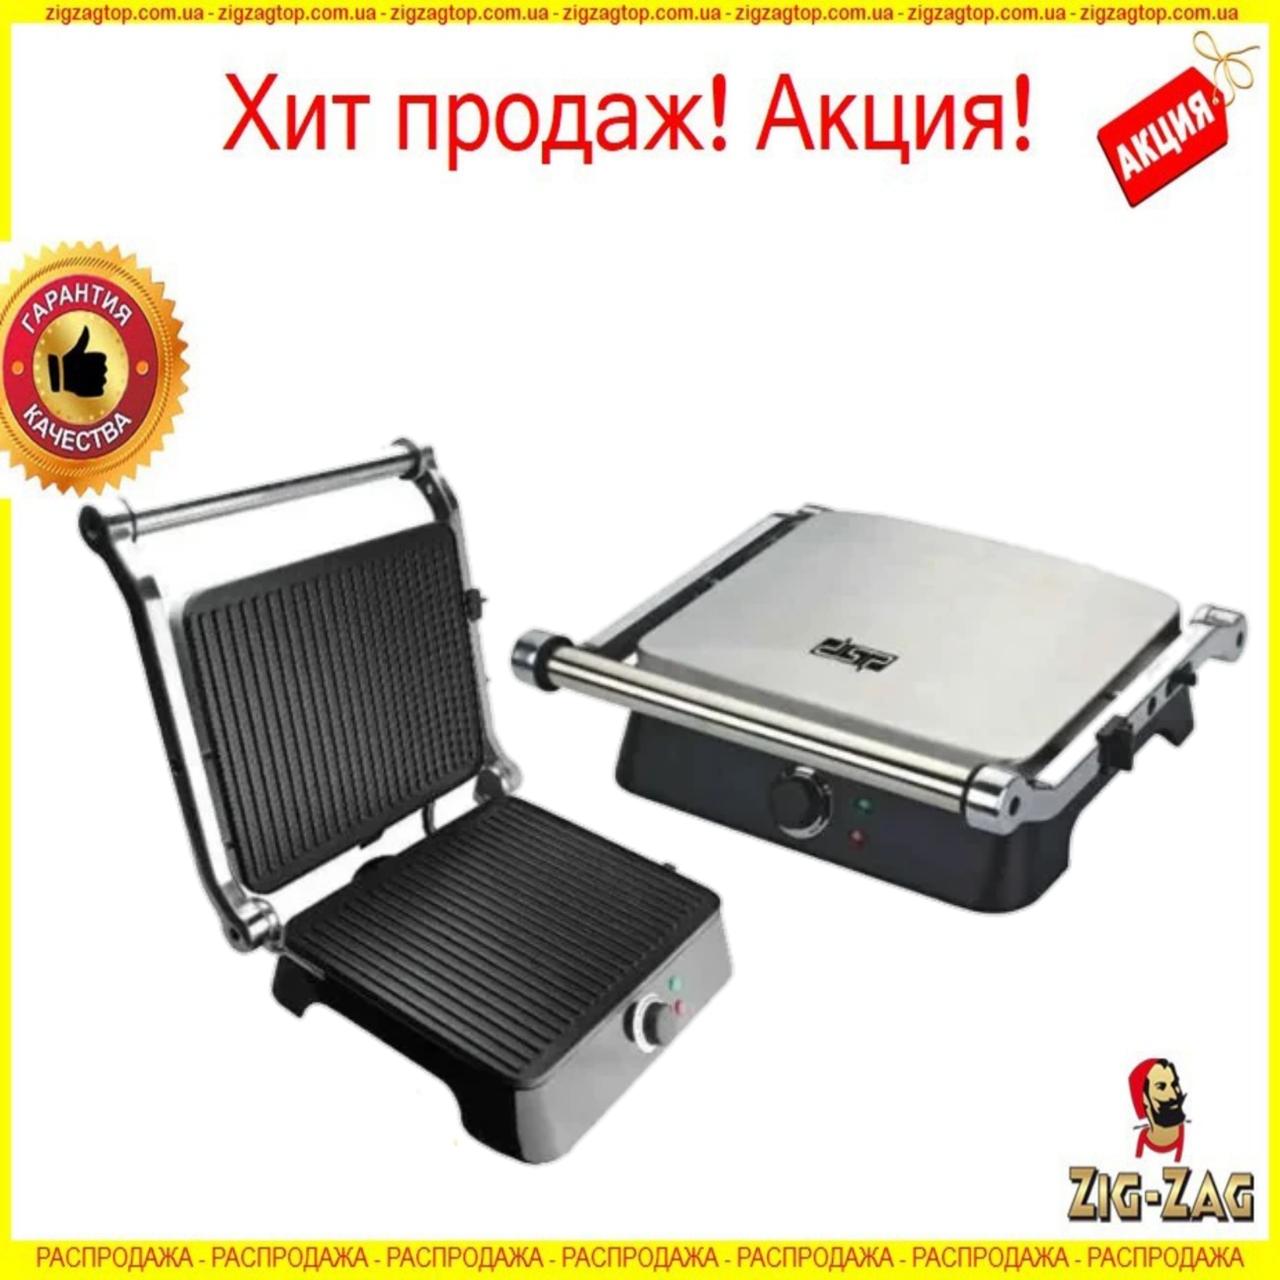 Електричний гриль DSP KB1001 Health Grill-Гриль барбекю електрогриль антипригарним покриттям 1400 Вт барбекю